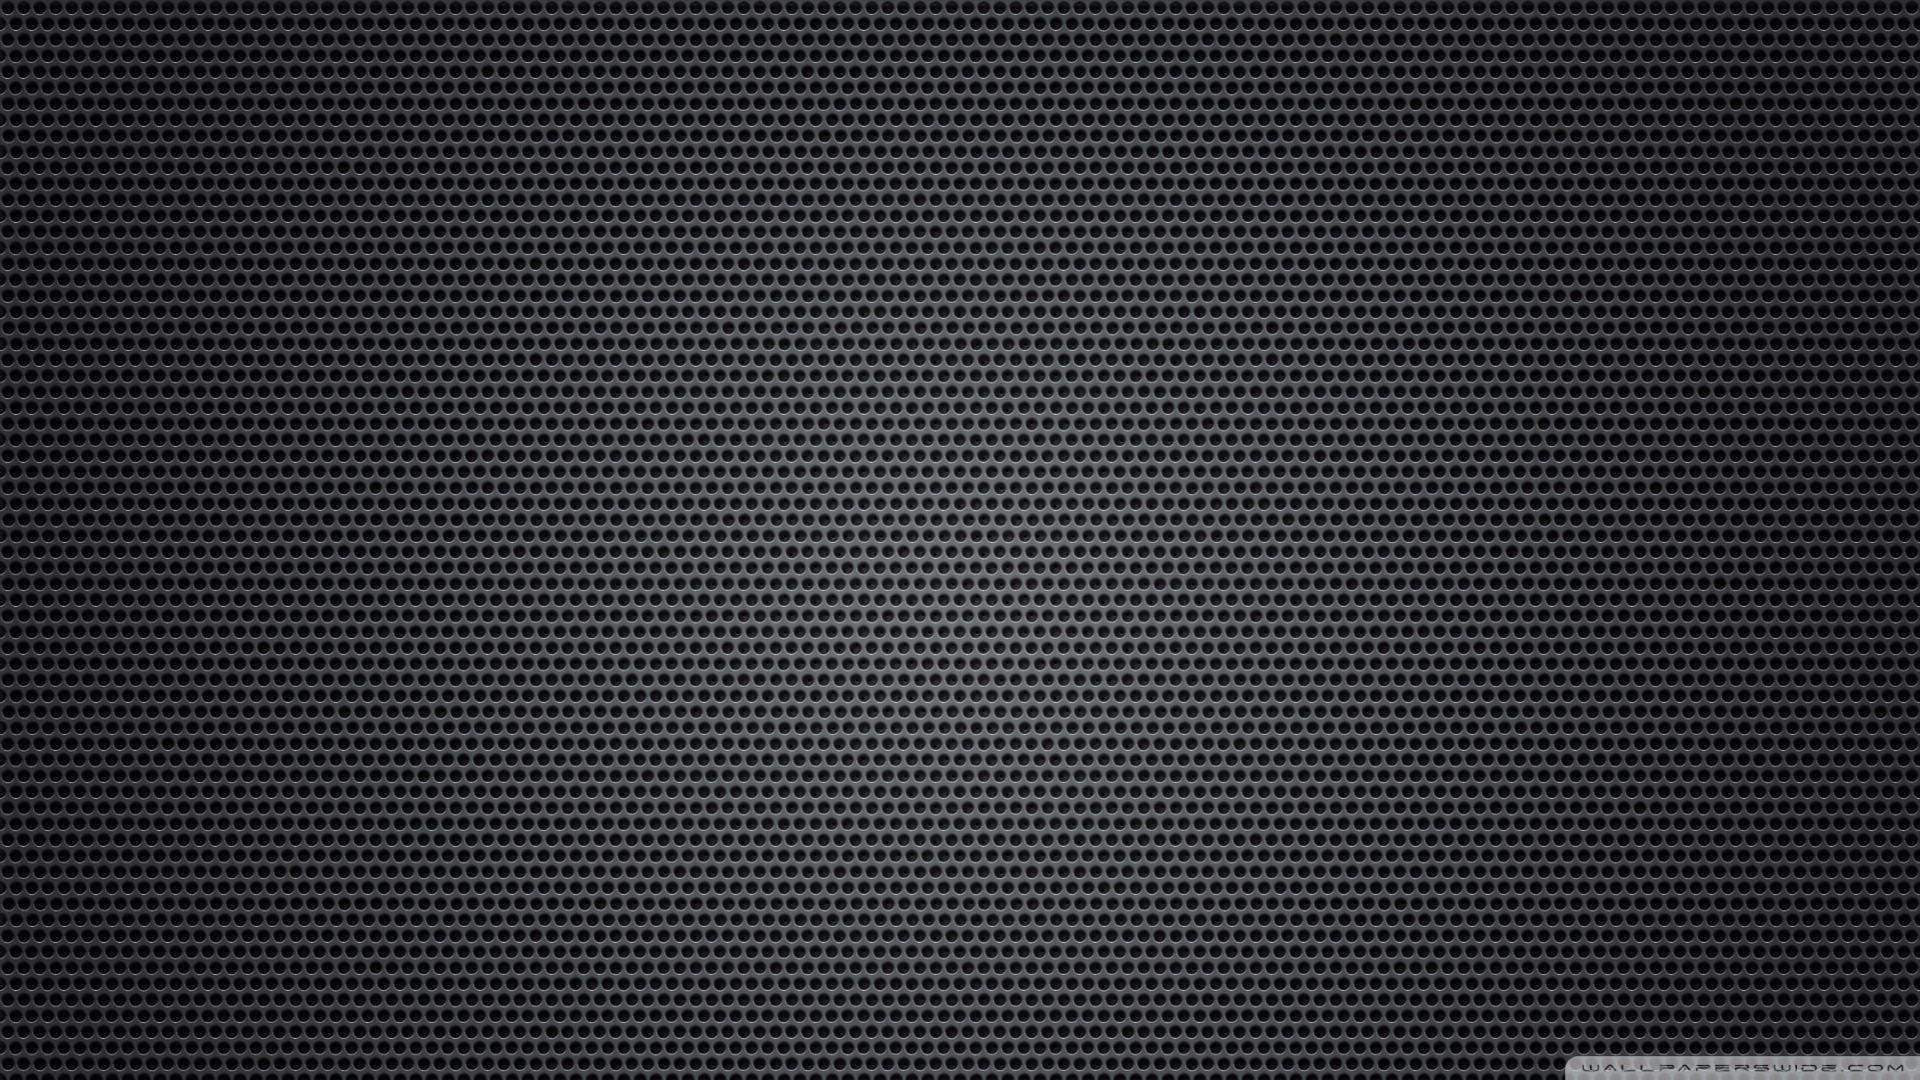 HD Metal Wallpapers & Metallic Backgrounds For Free Desktop Download #8672